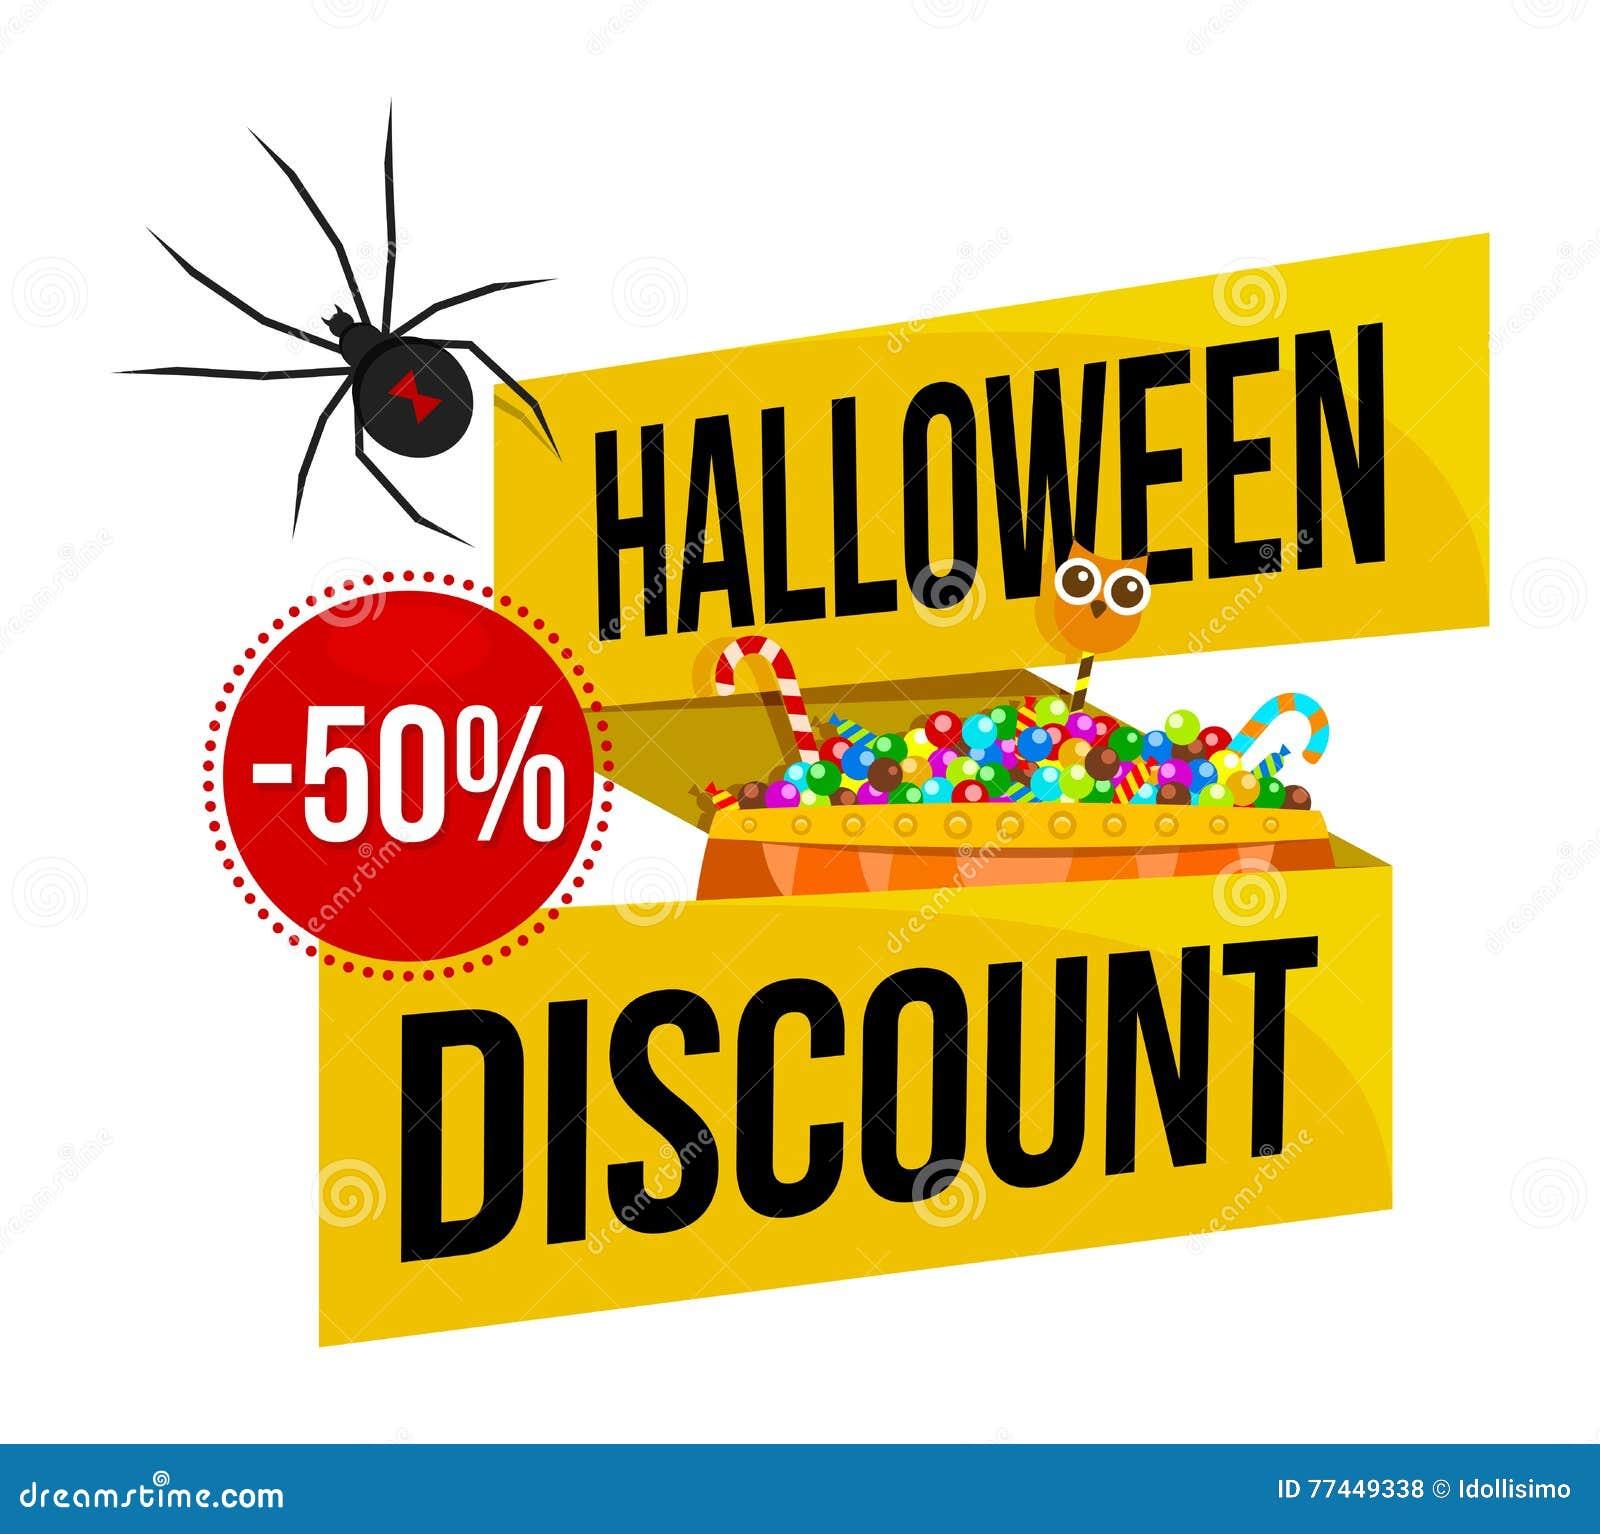 Halloween sale logo or label stock vector illustration for Cheap logo